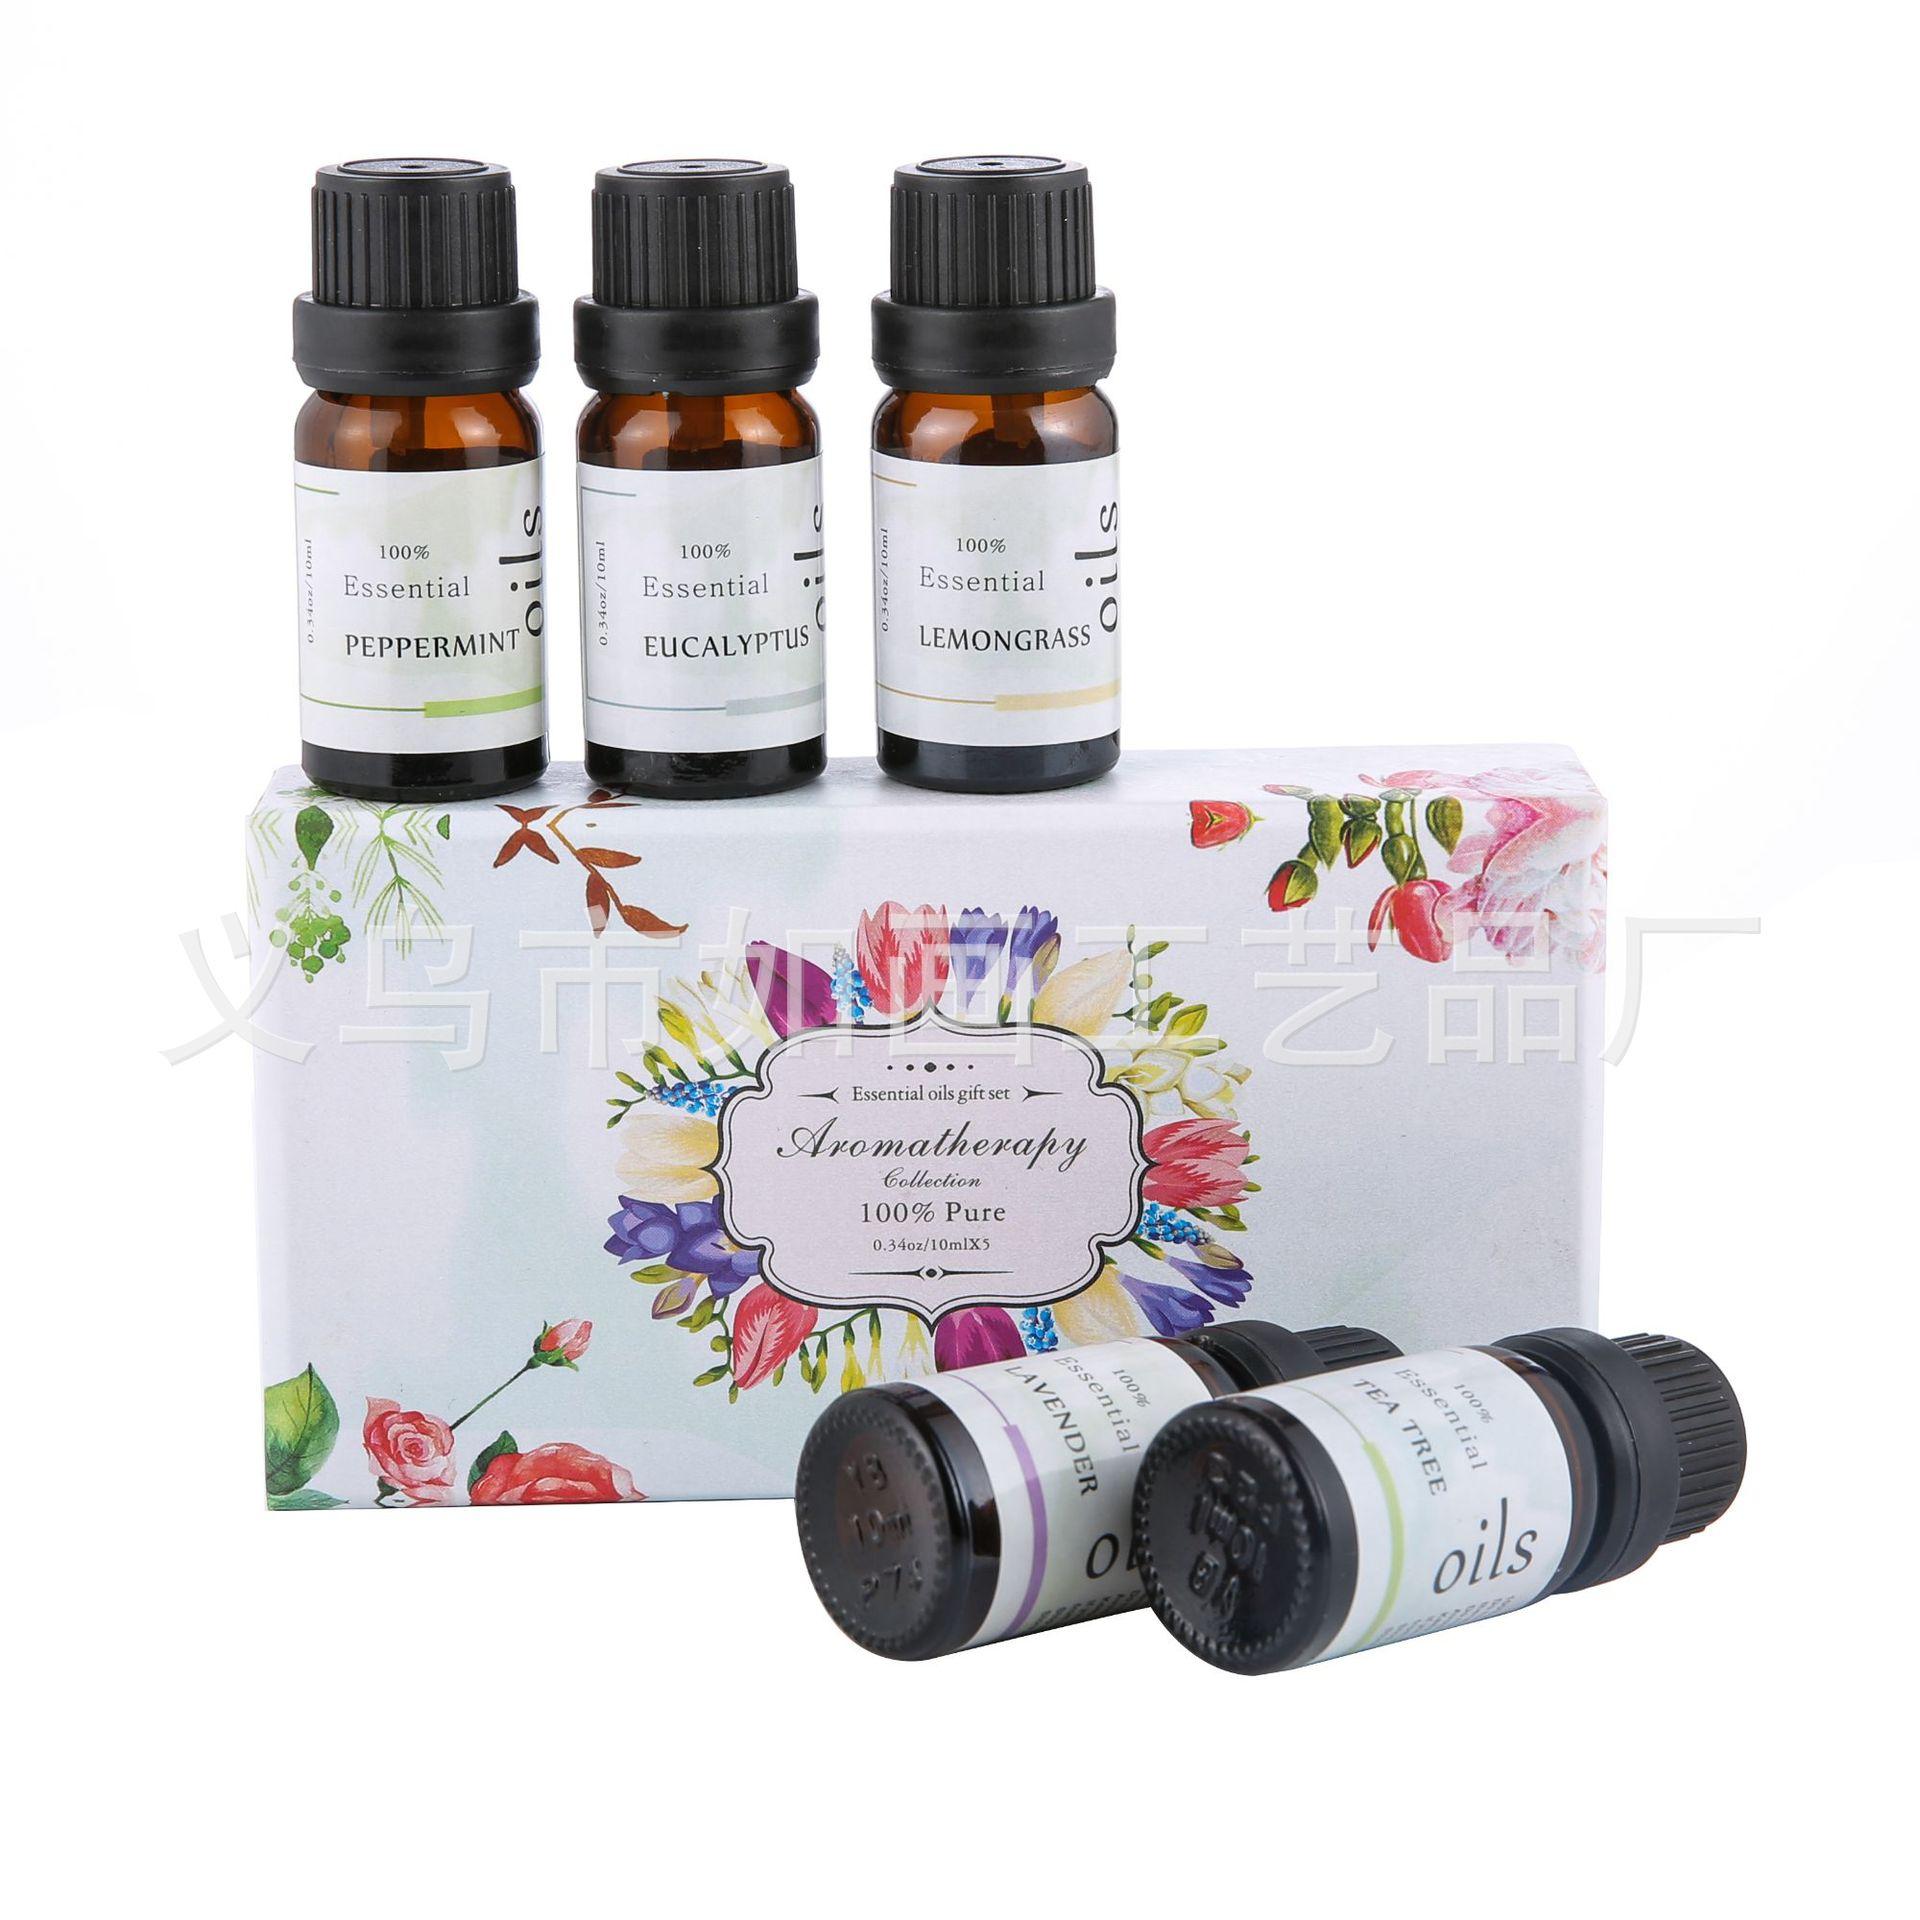 RH-05香薰精油集100%Essential oil高质量套装香味油 纯植物精油